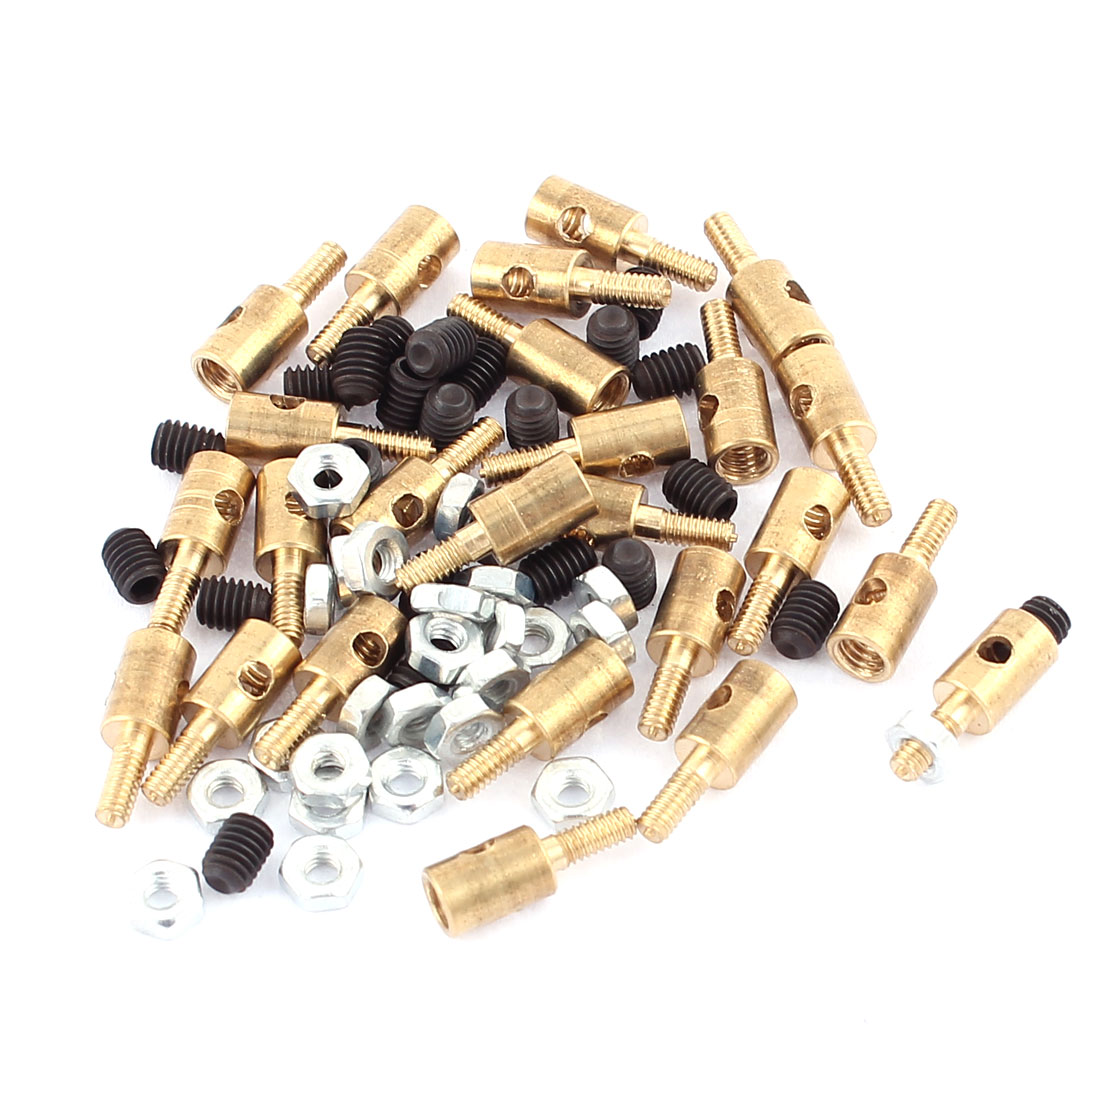 25pcs 4mmx2.1mm Pushrod Linkage Stopper Metal for RC Model w Nuts